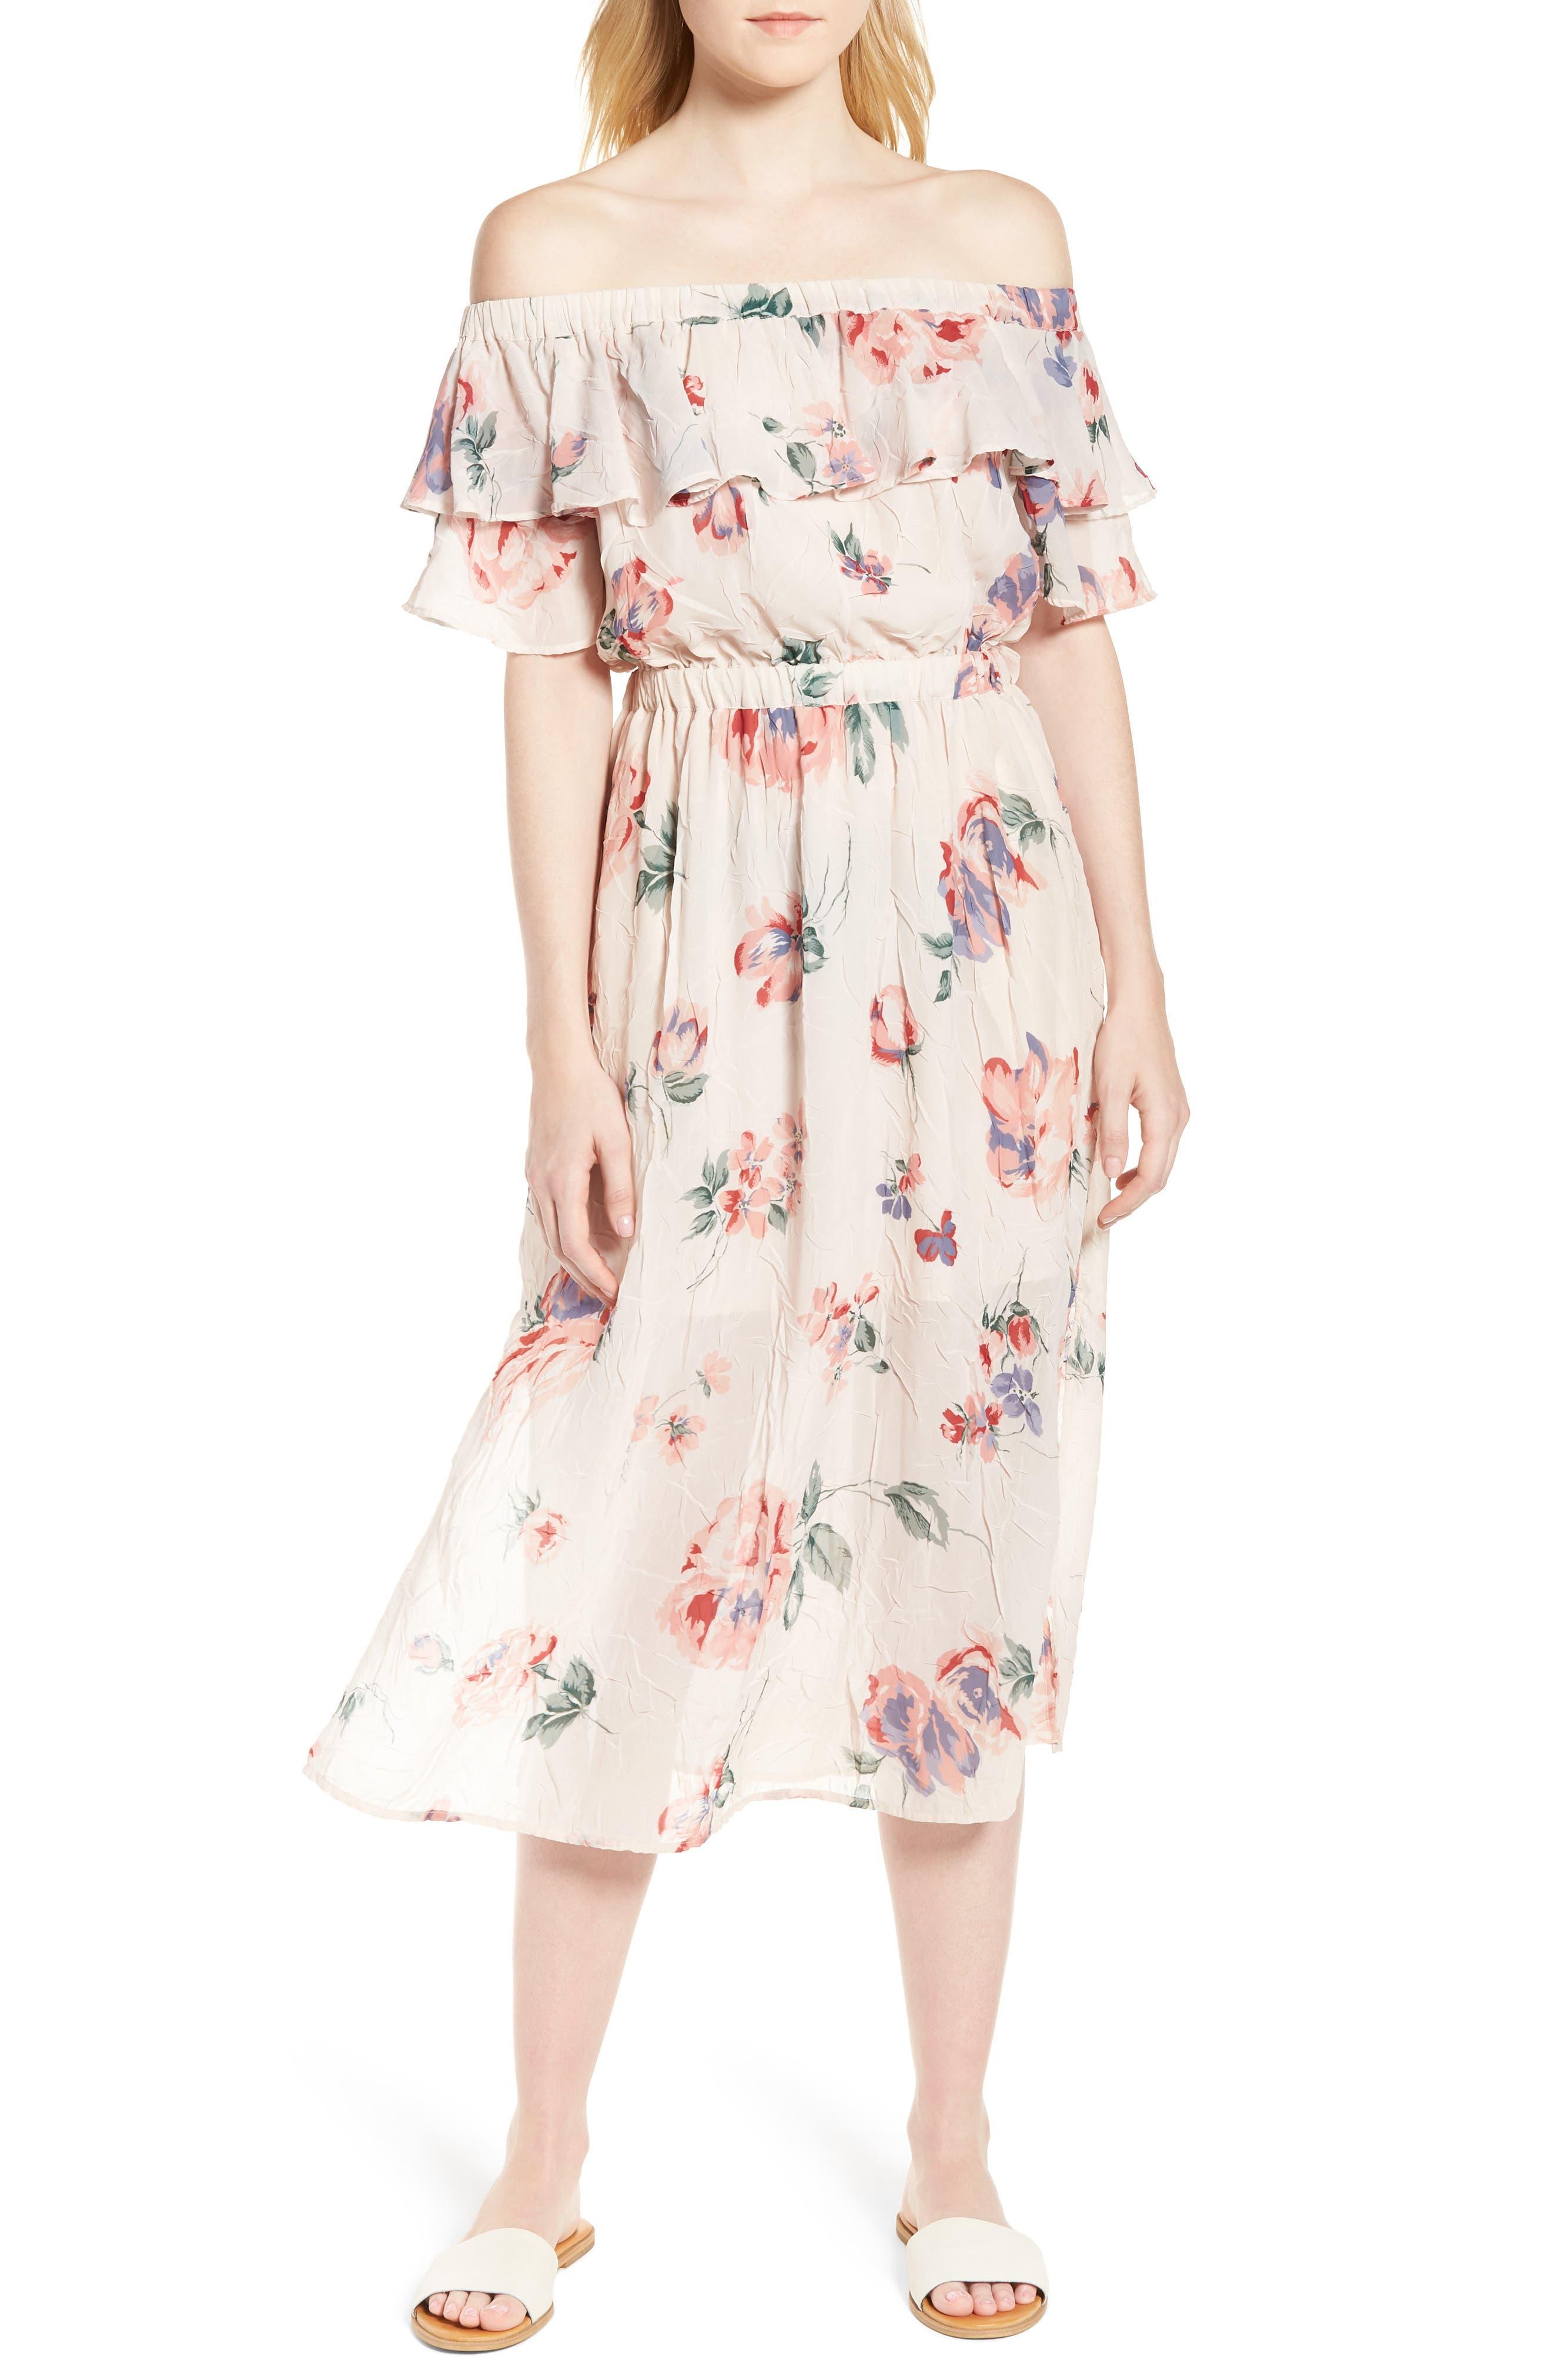 Off the Shoulder Floral Midi Dress,                             Main thumbnail 1, color,                             950